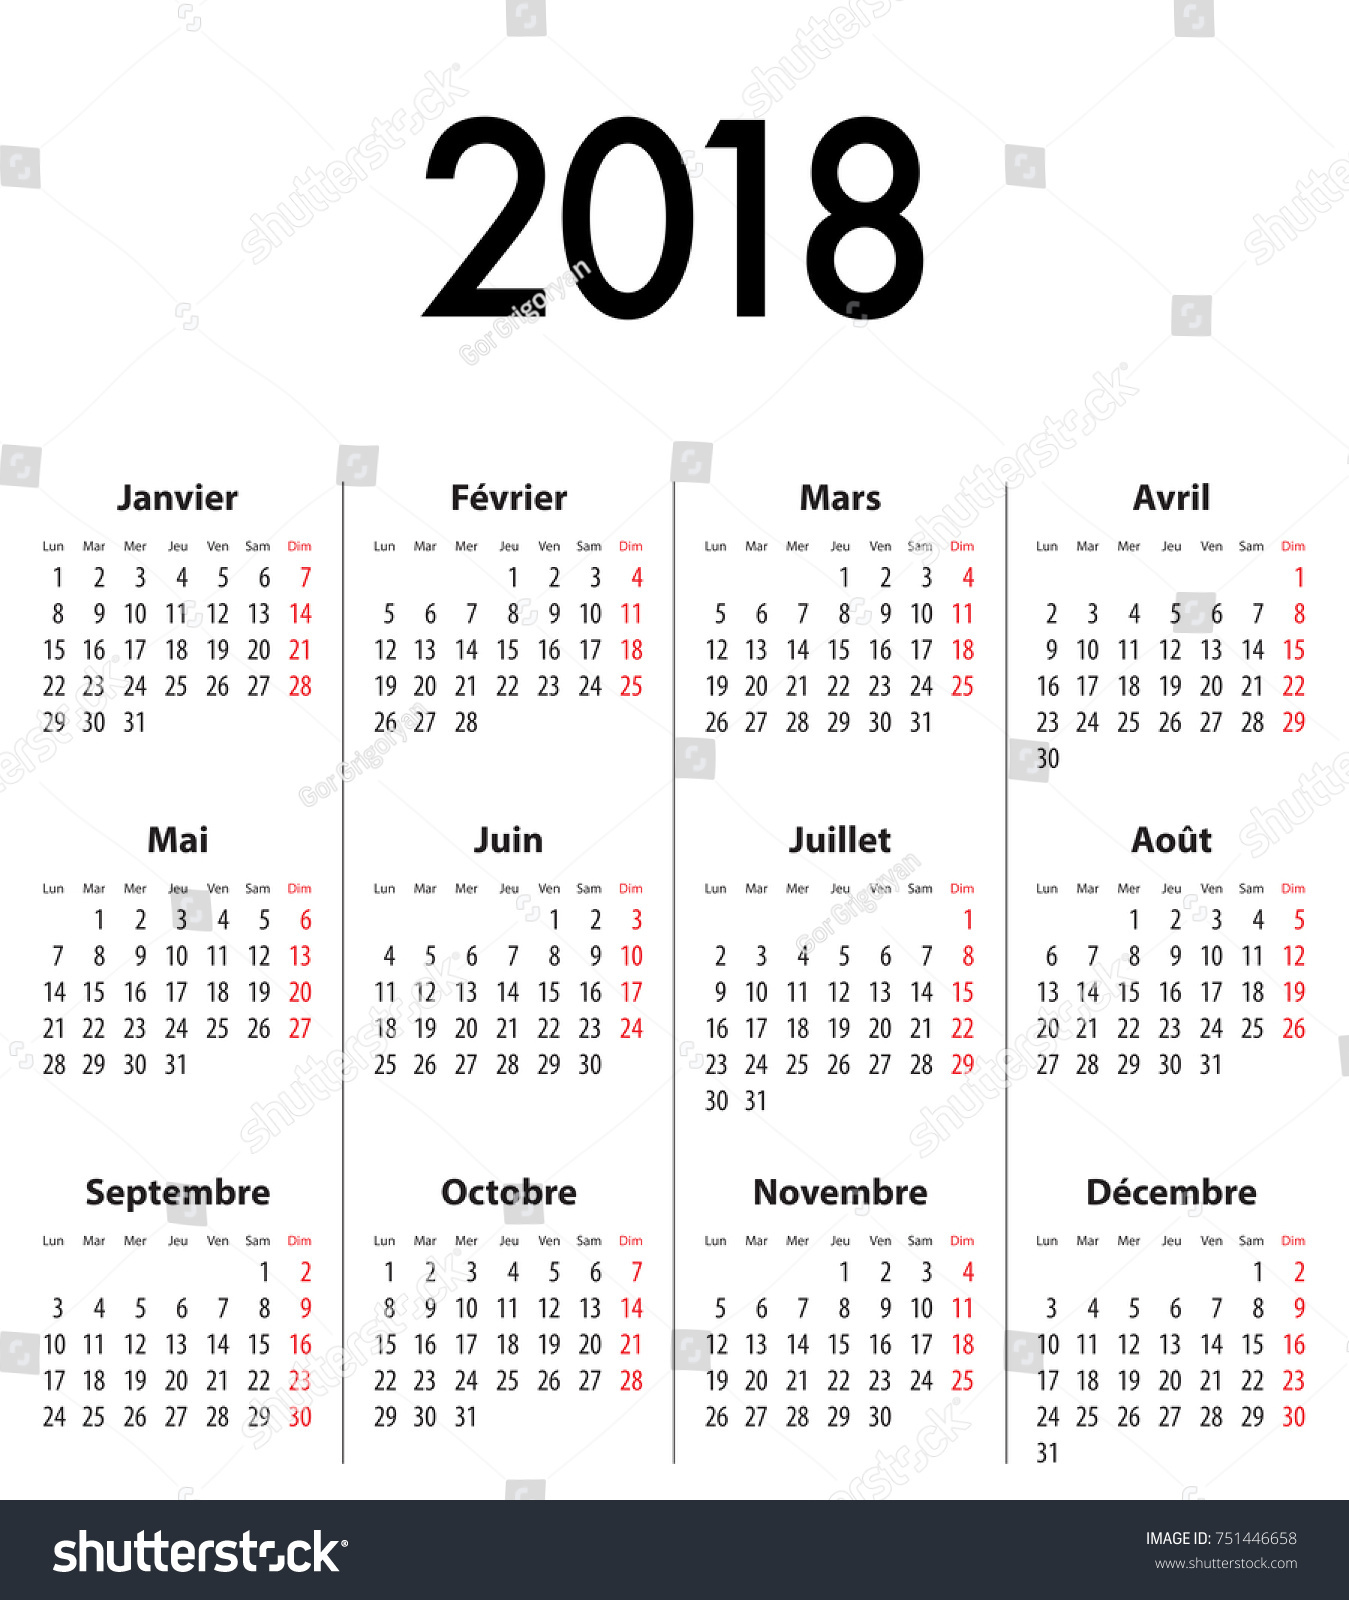 french calendar grid for 2018 best for calendar print business web design